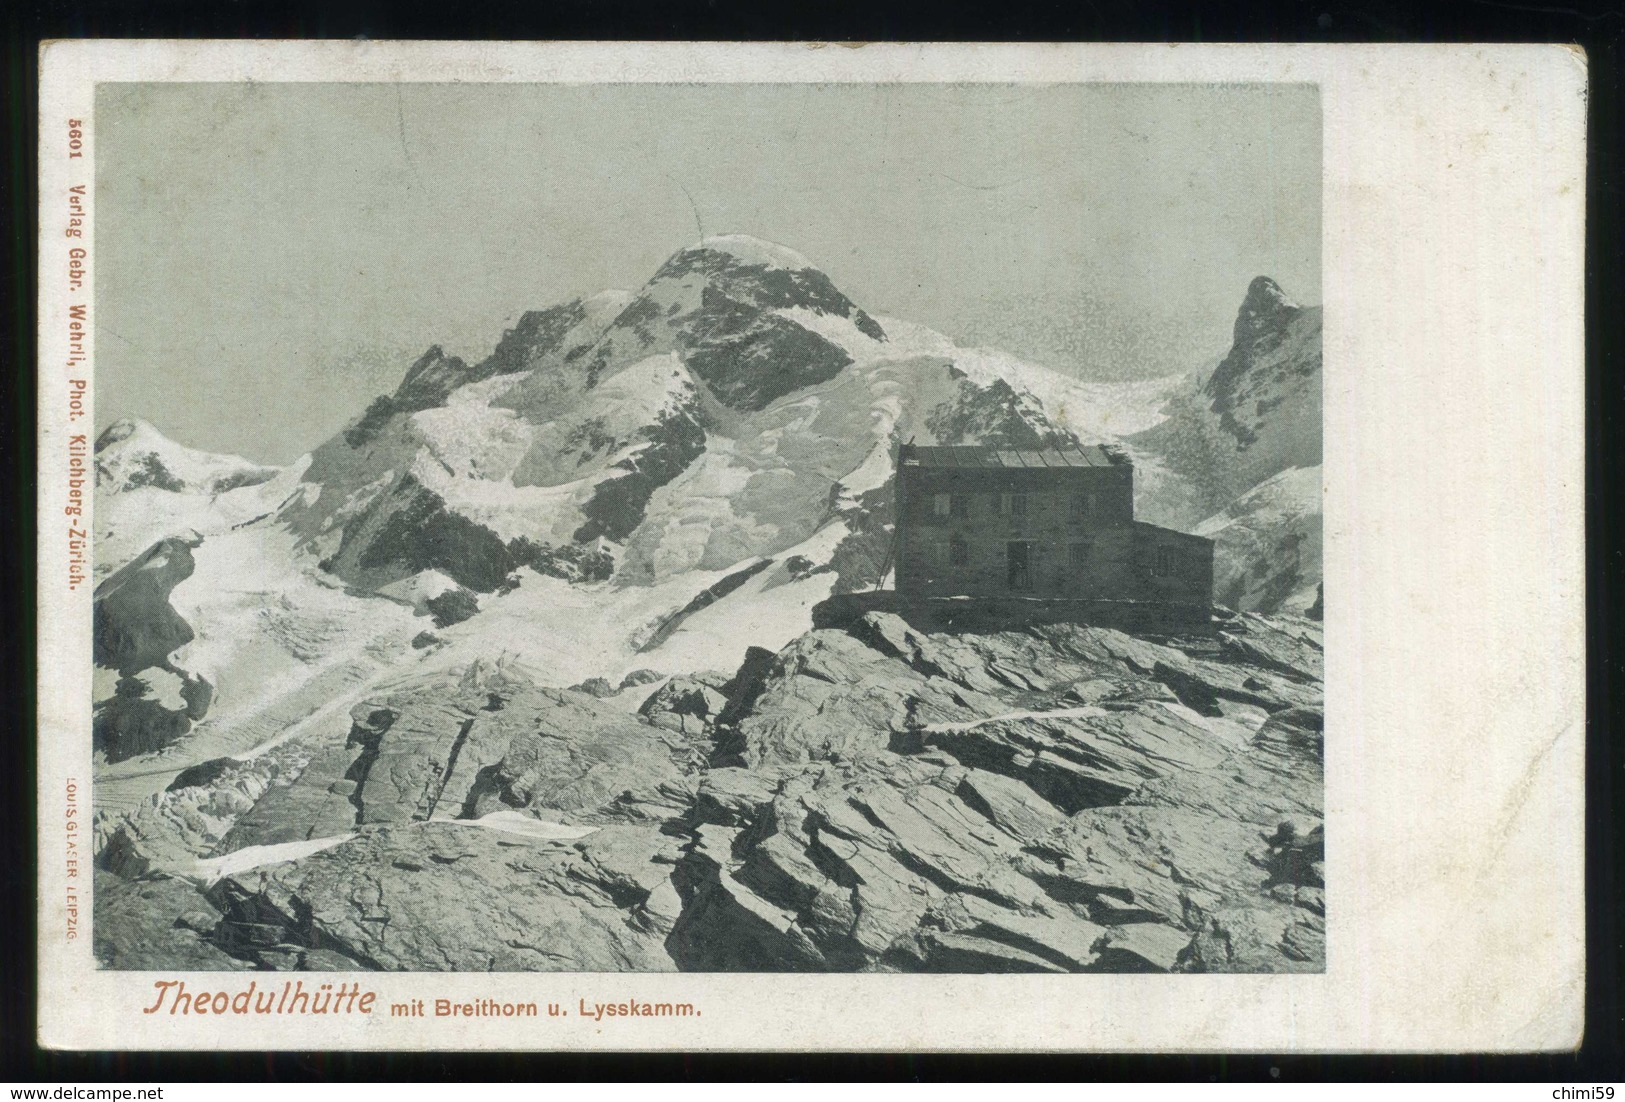 VALTOURNENCHE - RIFUGIO TEODULO - THEODULHUTTE - Italy